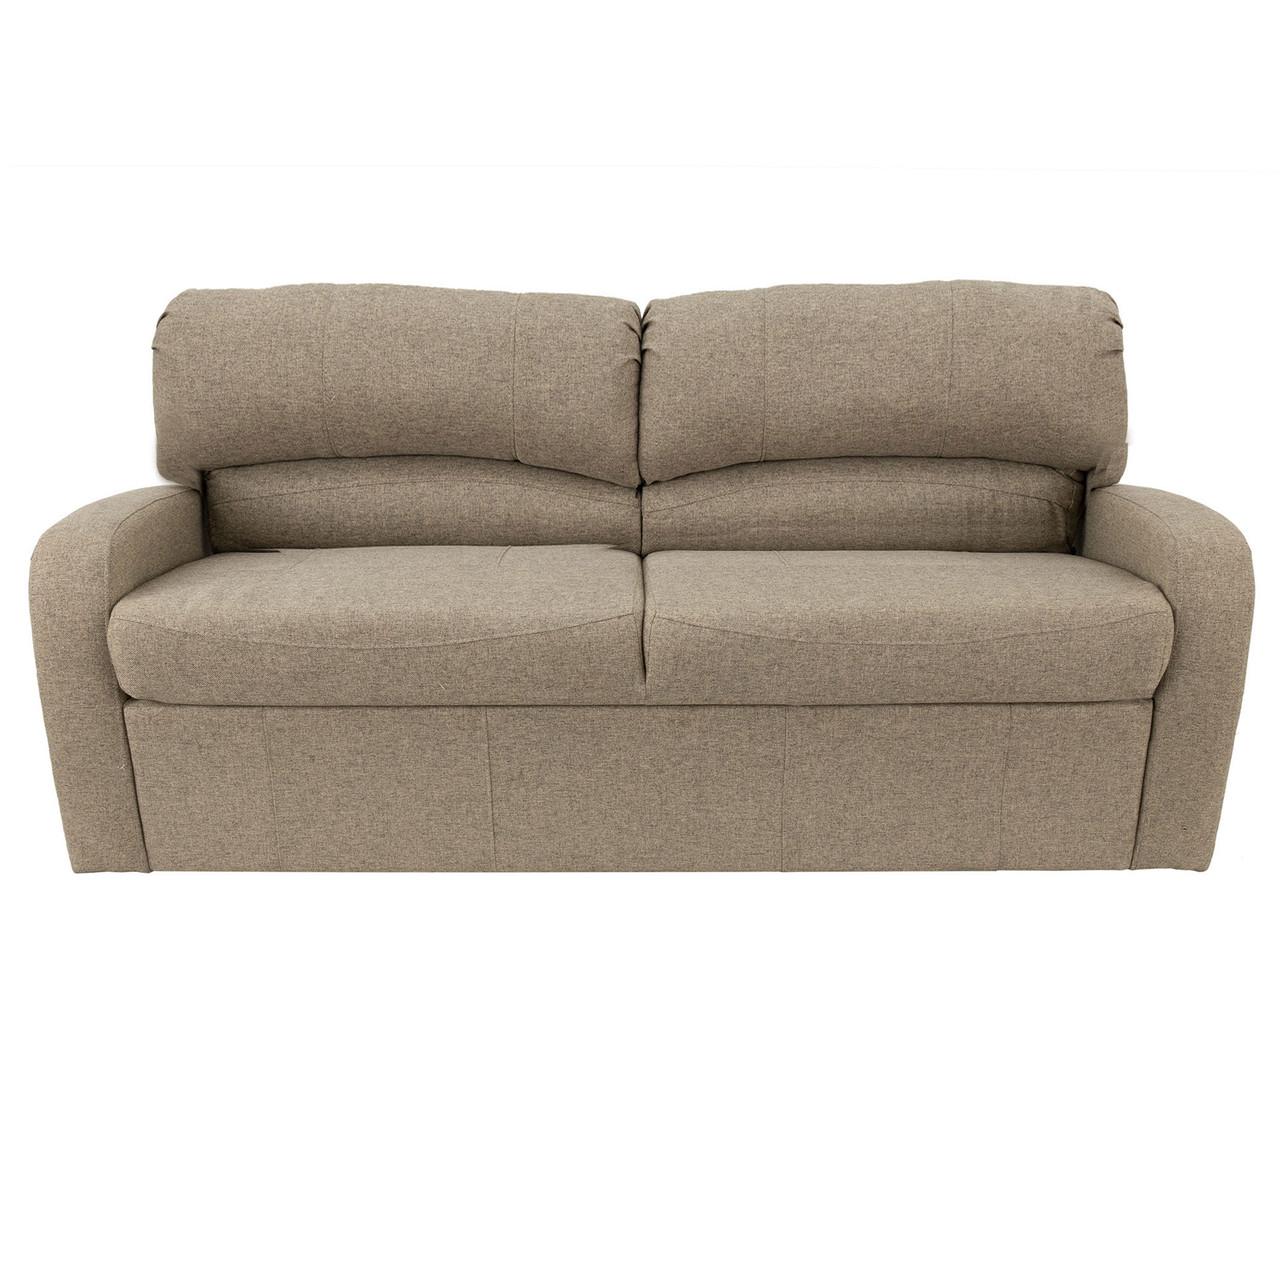 Strange 70 Jack Knife Rv Sleeper Sofa Cloth Recpro Pdpeps Interior Chair Design Pdpepsorg